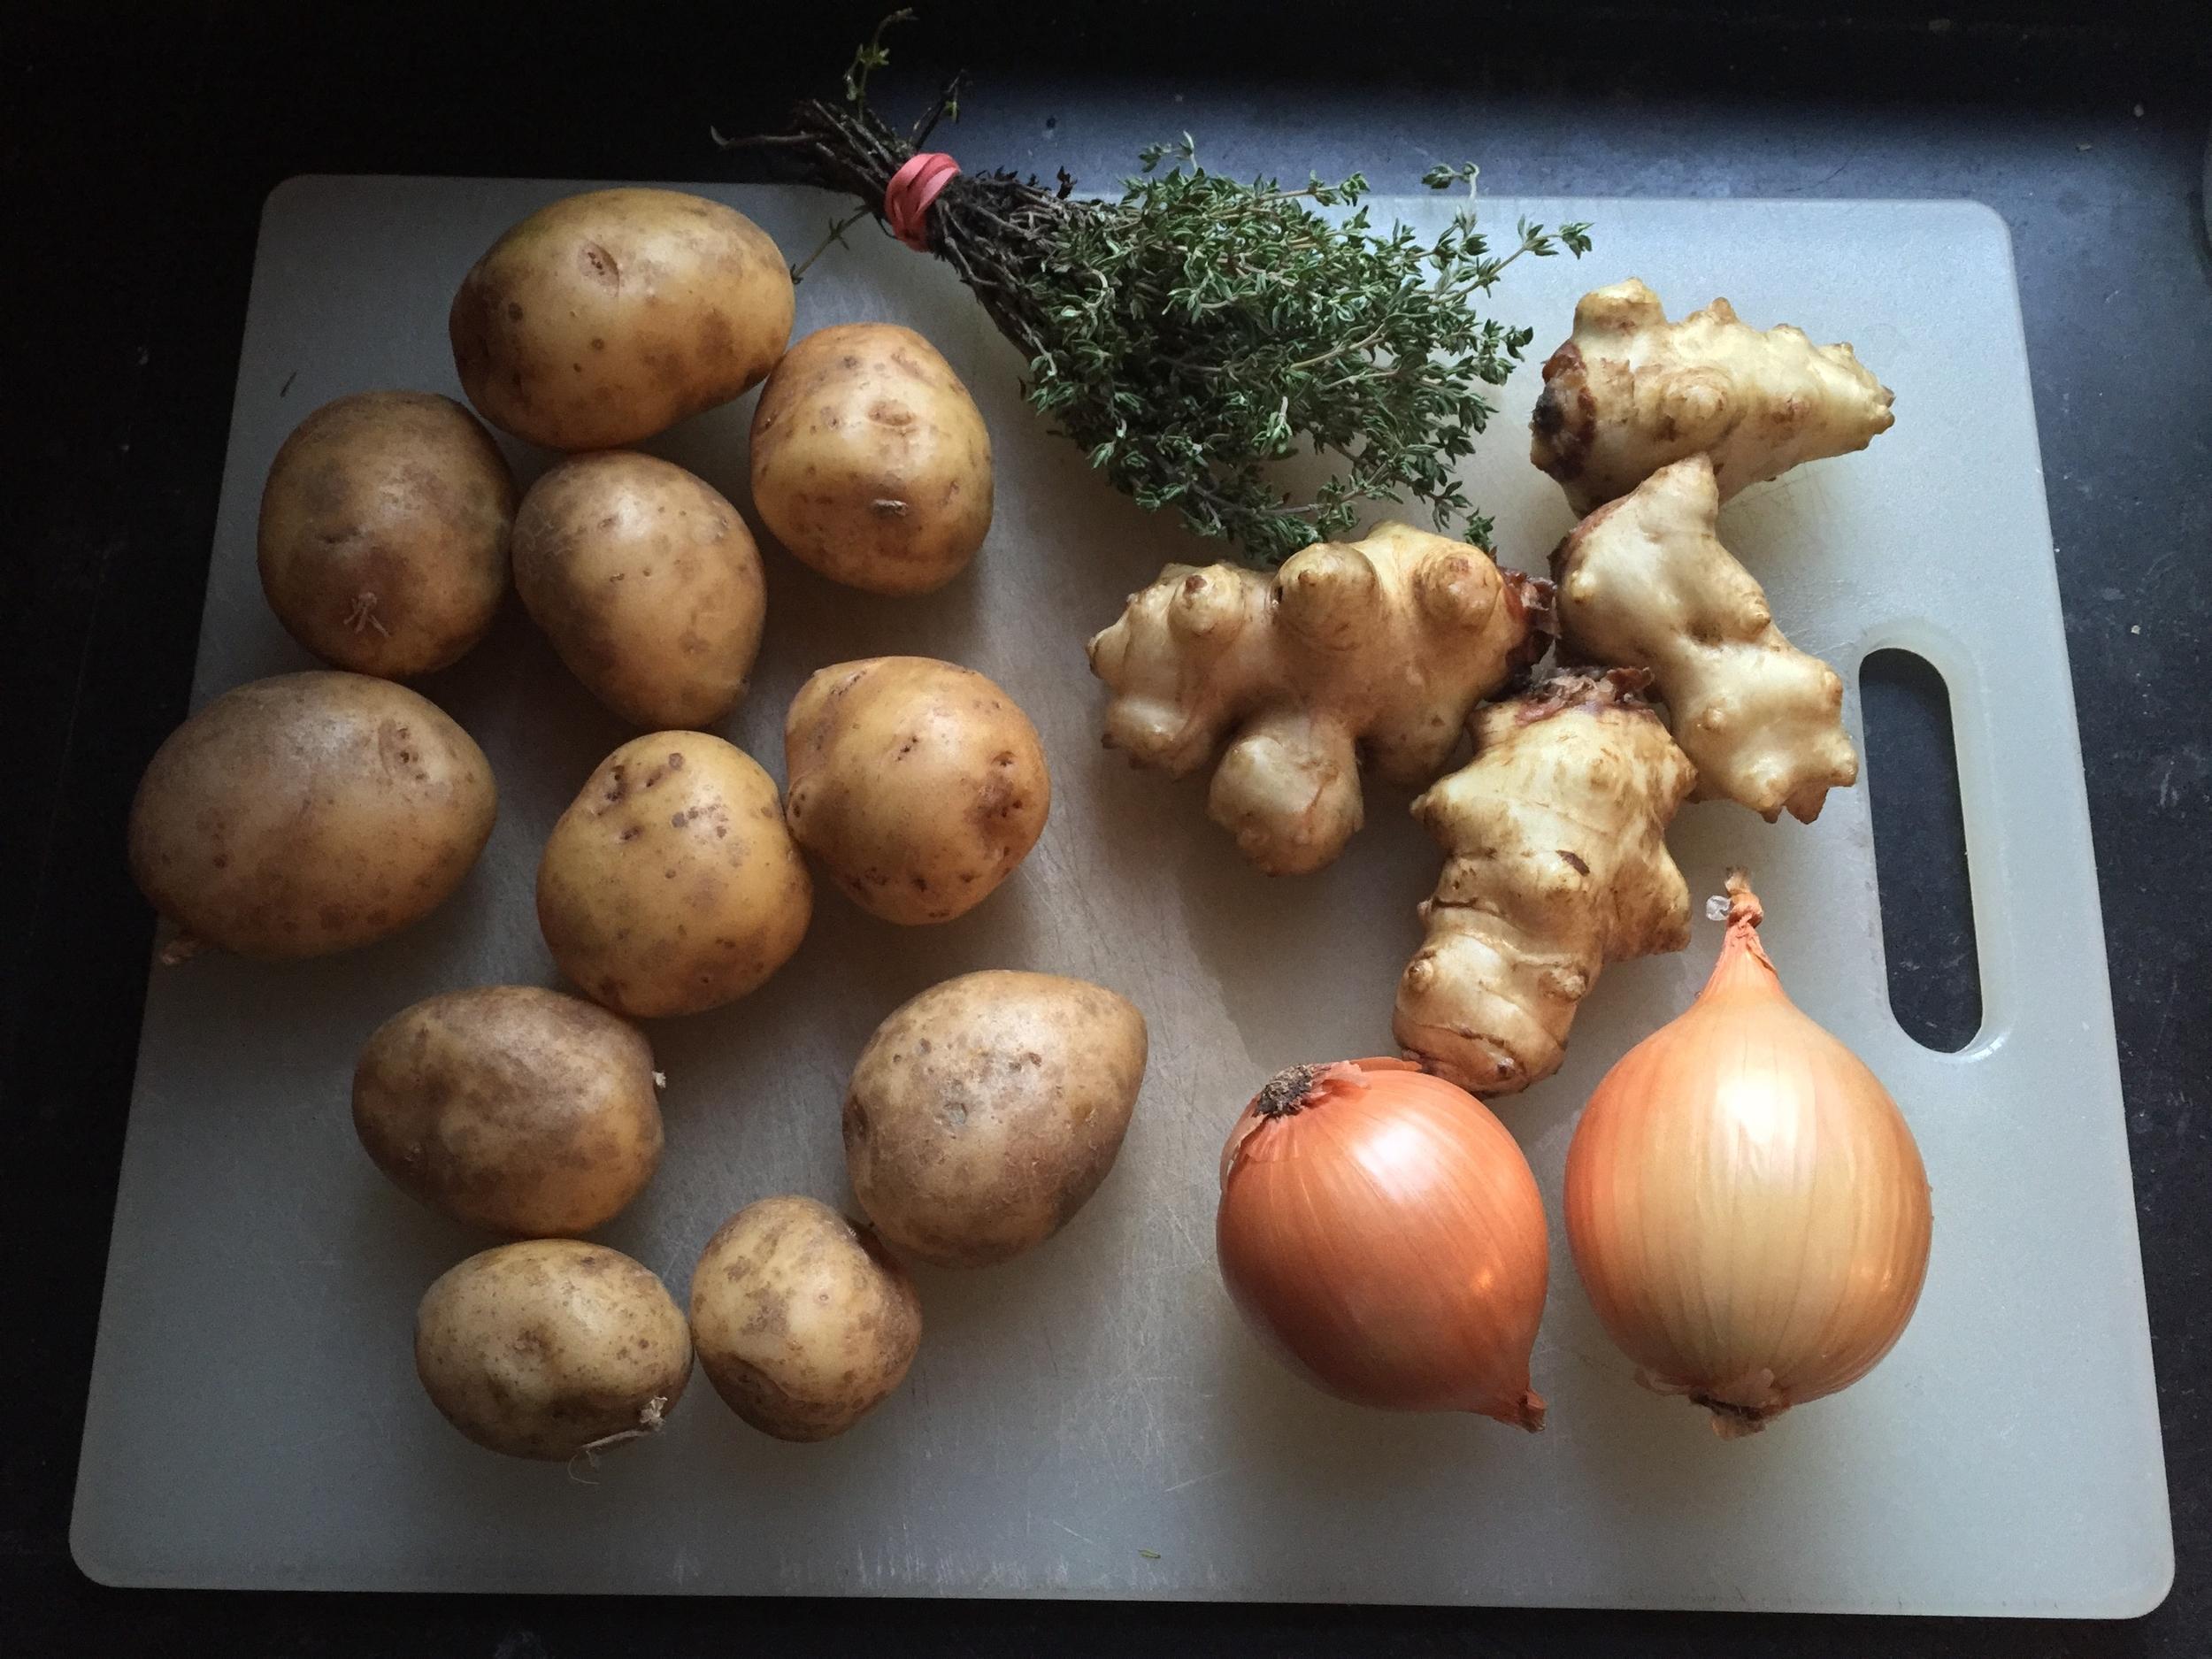 Soup mise: thyme, potatoes, sunchokes, onions.